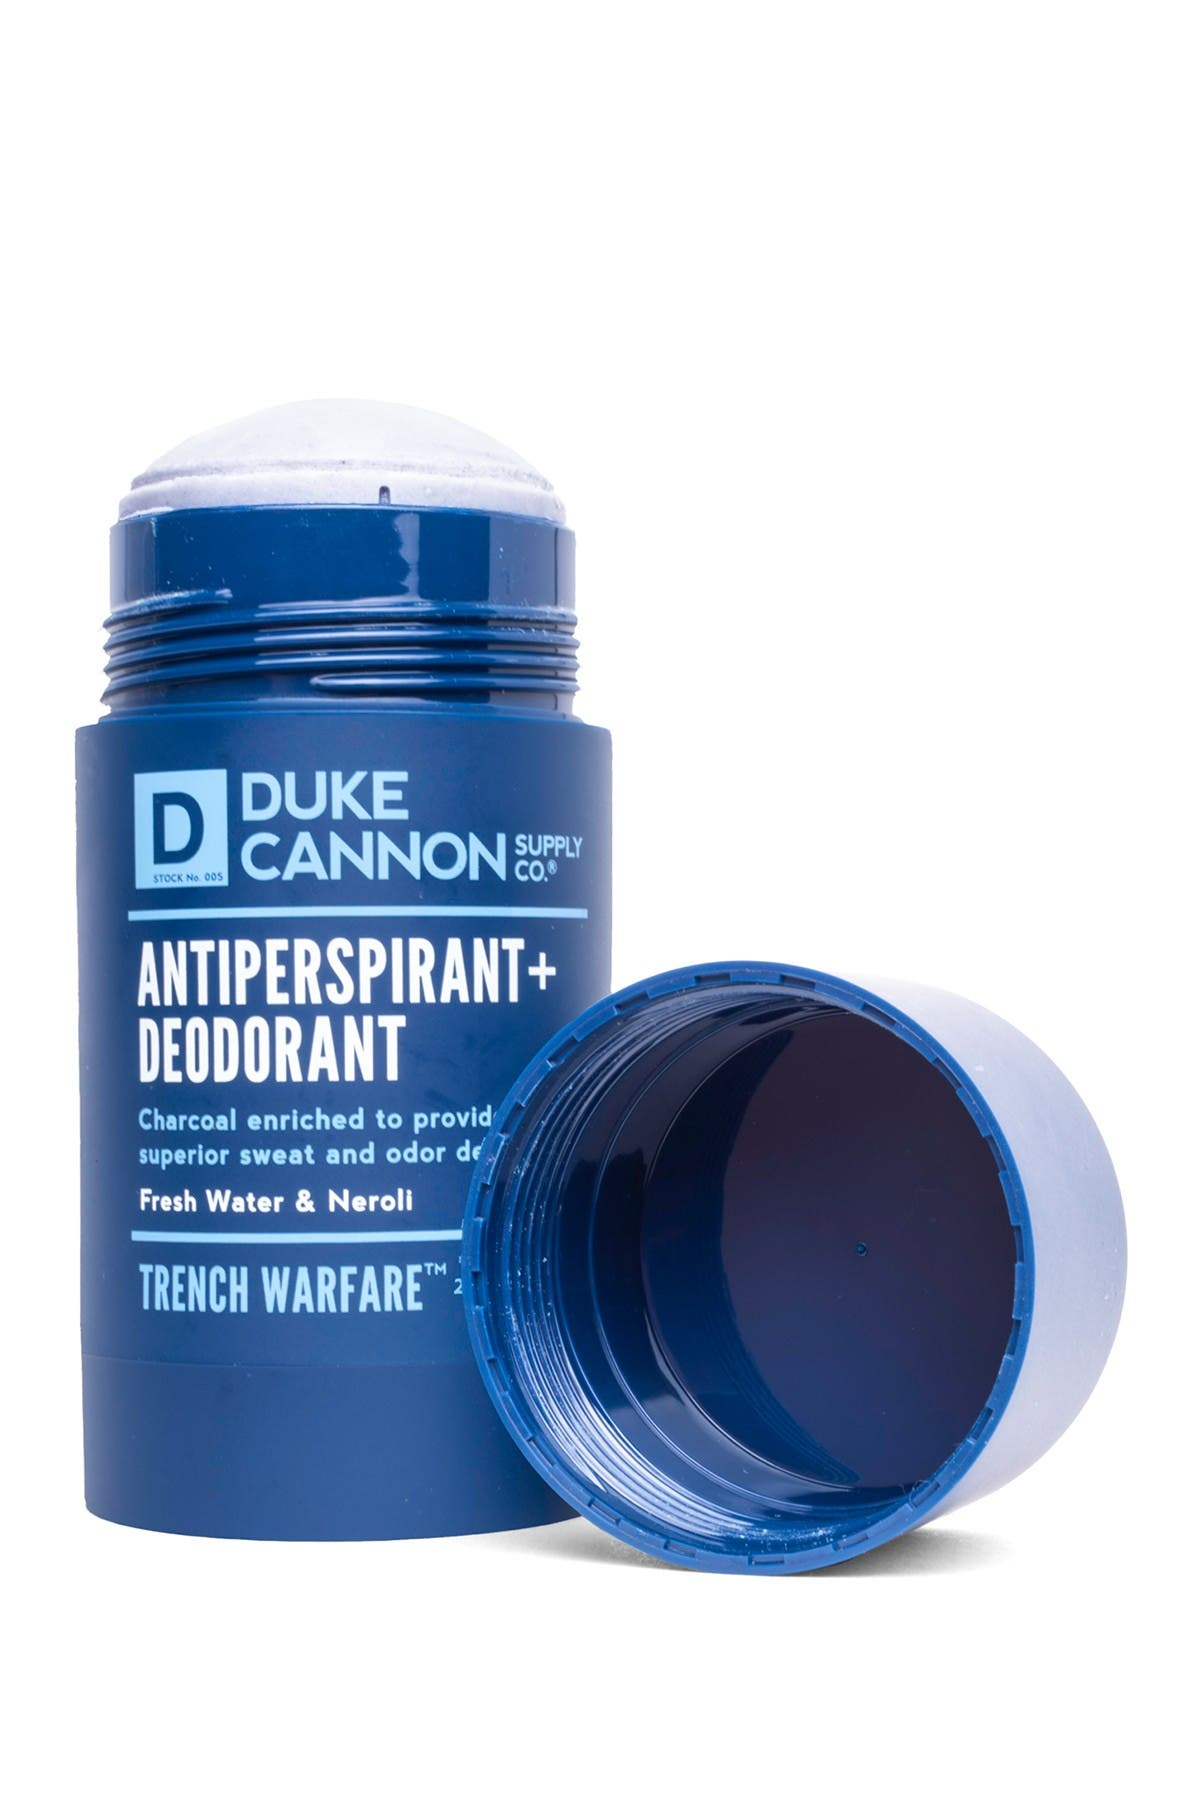 Image of DUKE CANNON Trench Warfare Antiperspirant + Deodorant - Fresh Water + Neroli